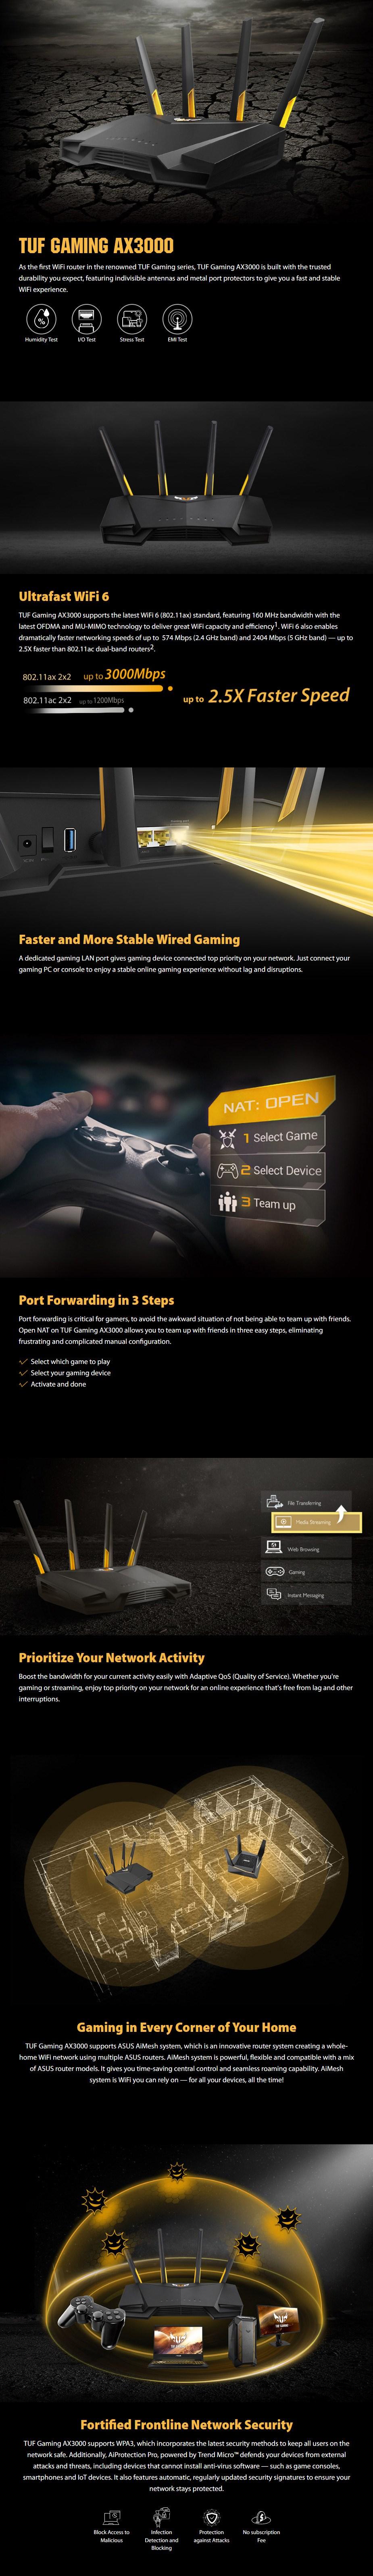 asus-tuf-gaming-ax3000-dual-band-wifi-6-gaming-router-ac35149-7.jpg